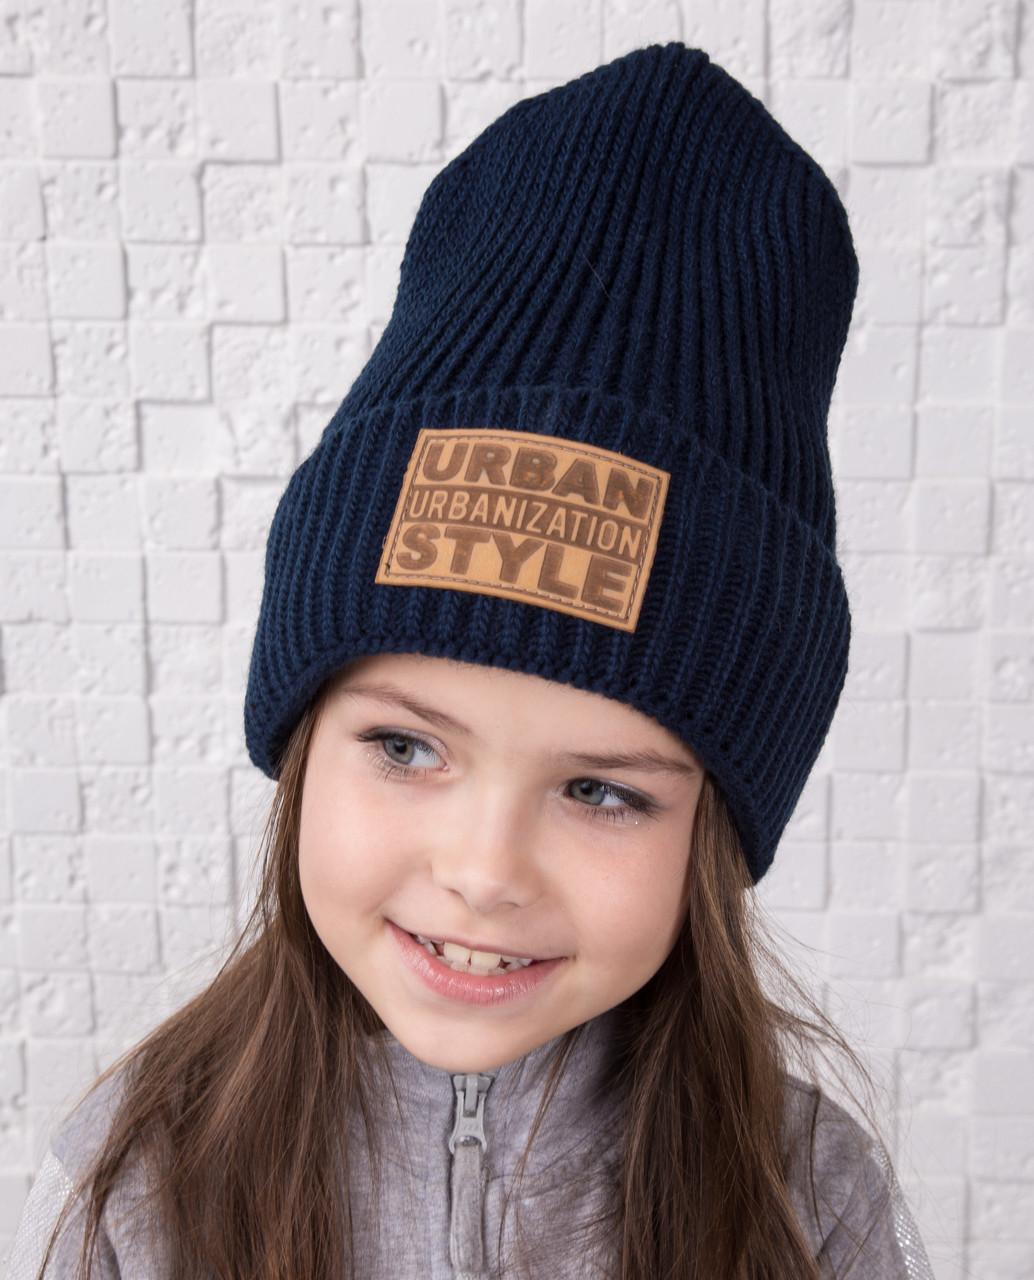 Стильная вязаная шапка для девочки - Urban Style - Артикул olna (разные цвета)